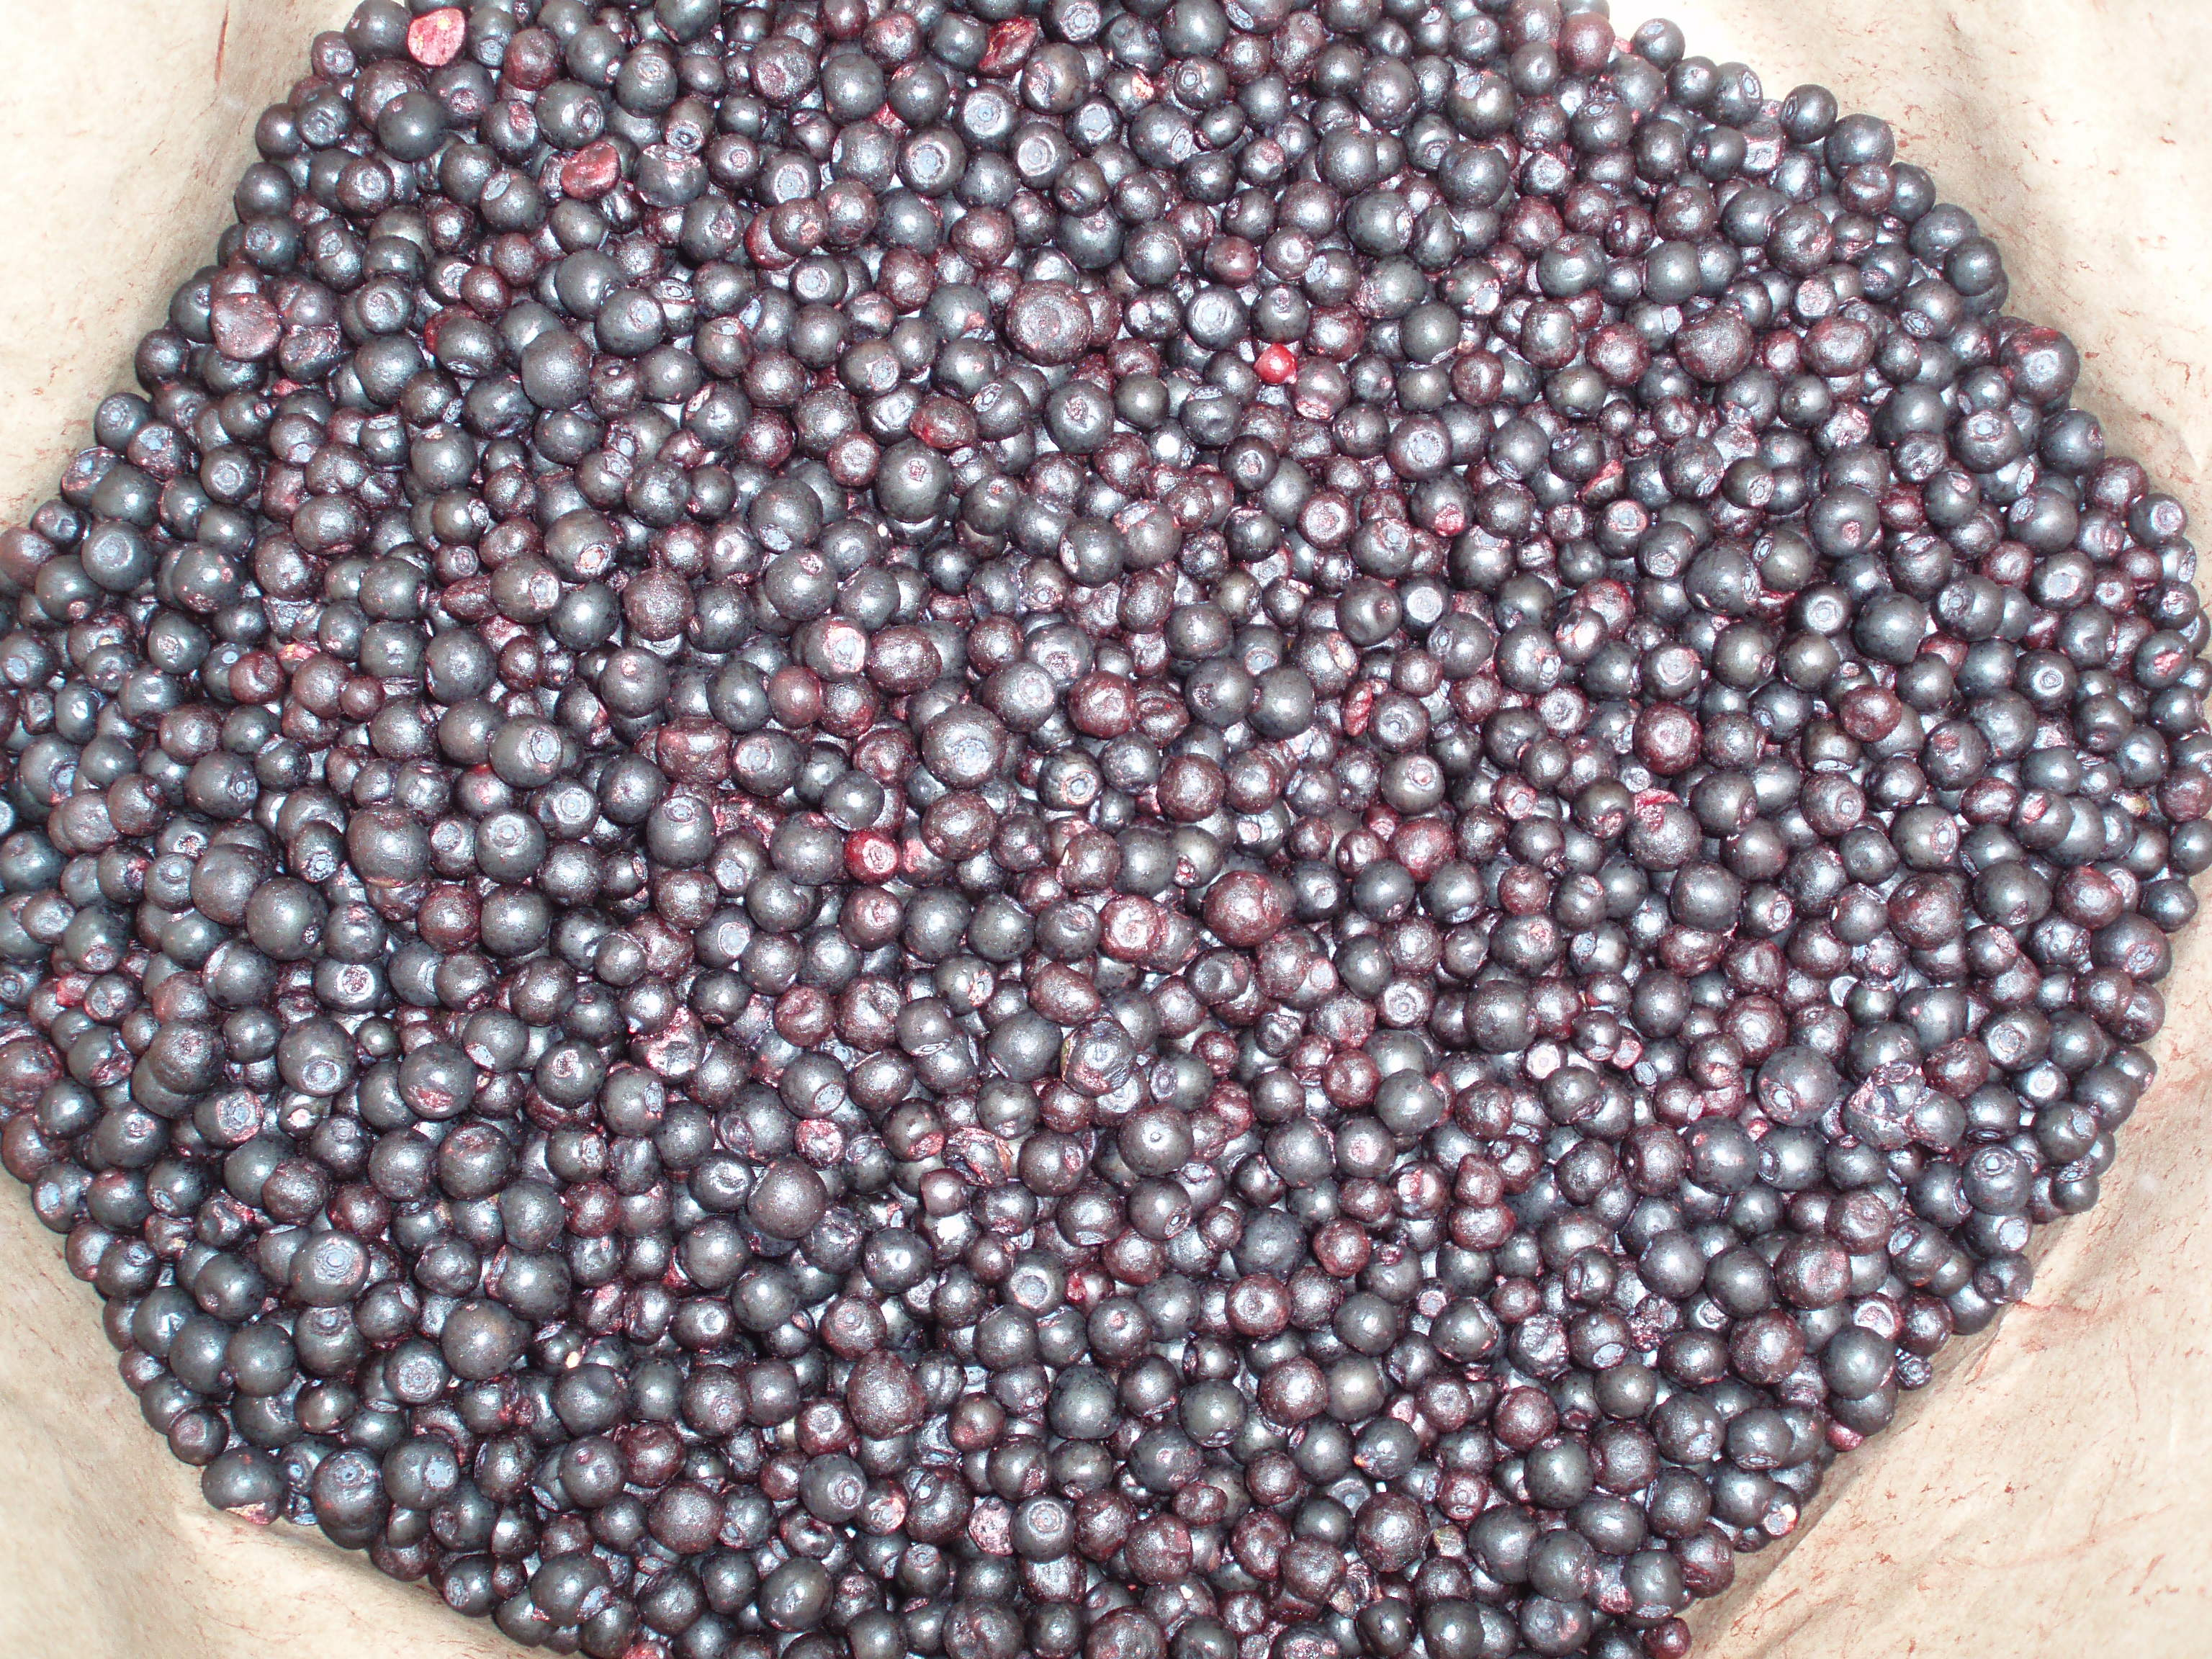 Cleaned vaccinium bilberry.